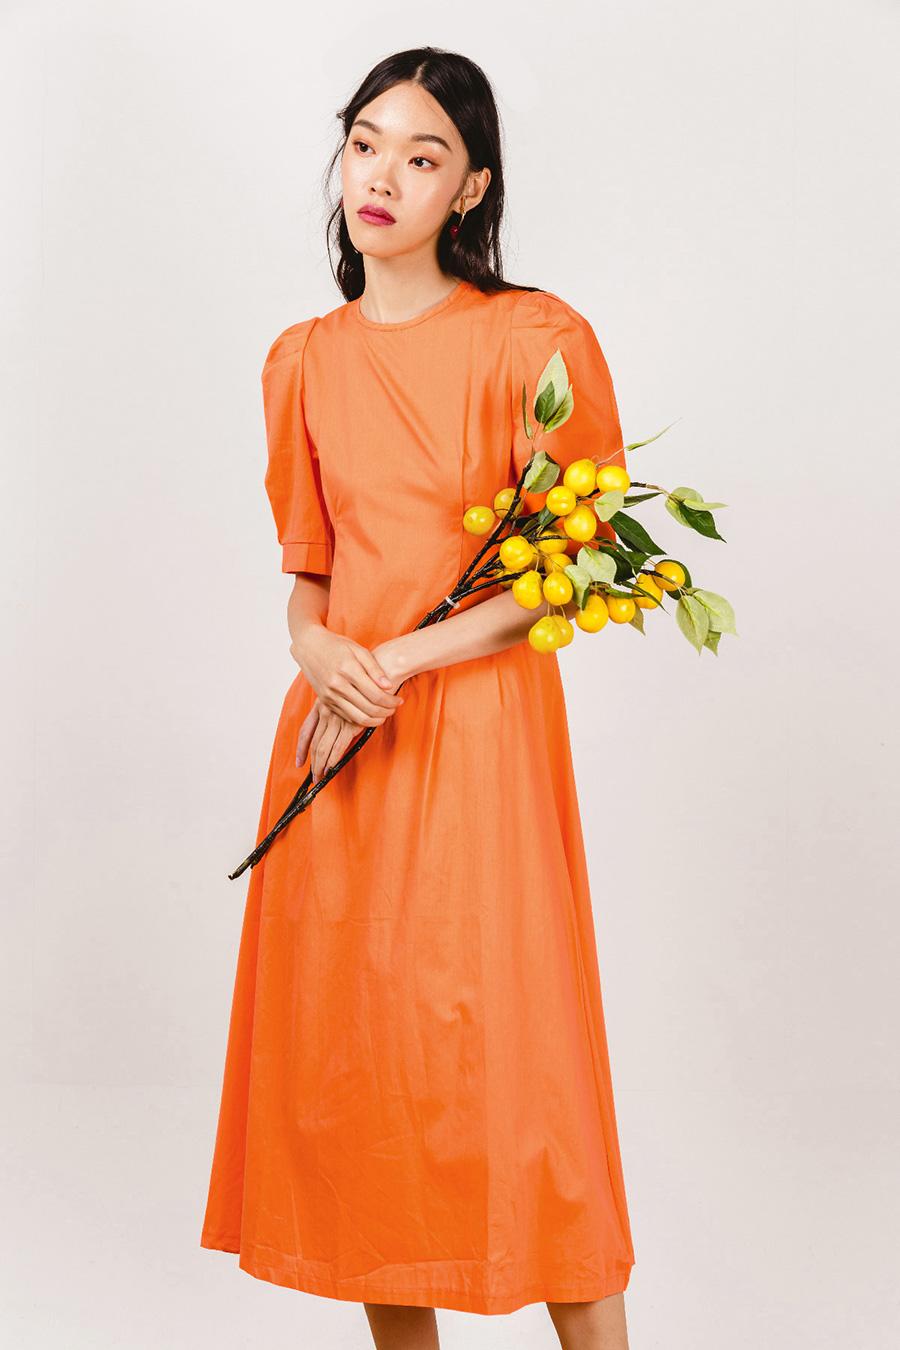 ANGELOU DRESS - VERMILLION